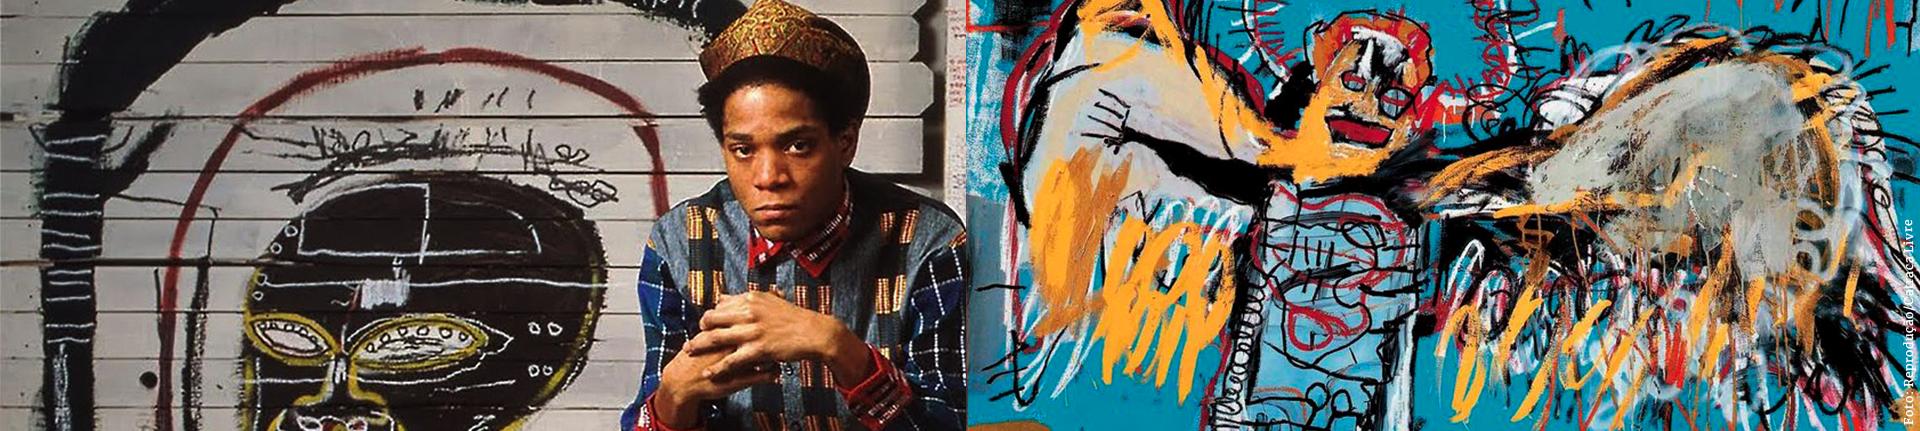 Exposição Jean Michel Basquiat no CCBB-Brasilia